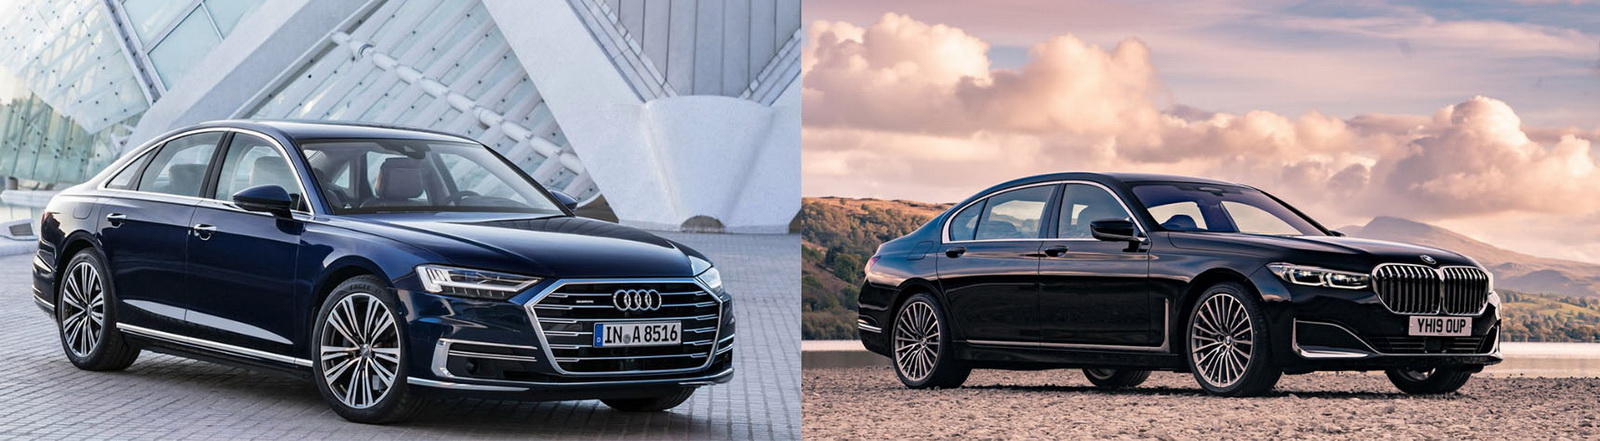 圖 / Audi A8 50 TDI quattro與BMW 7-Series(NEW) 730i之旗艦房車對決